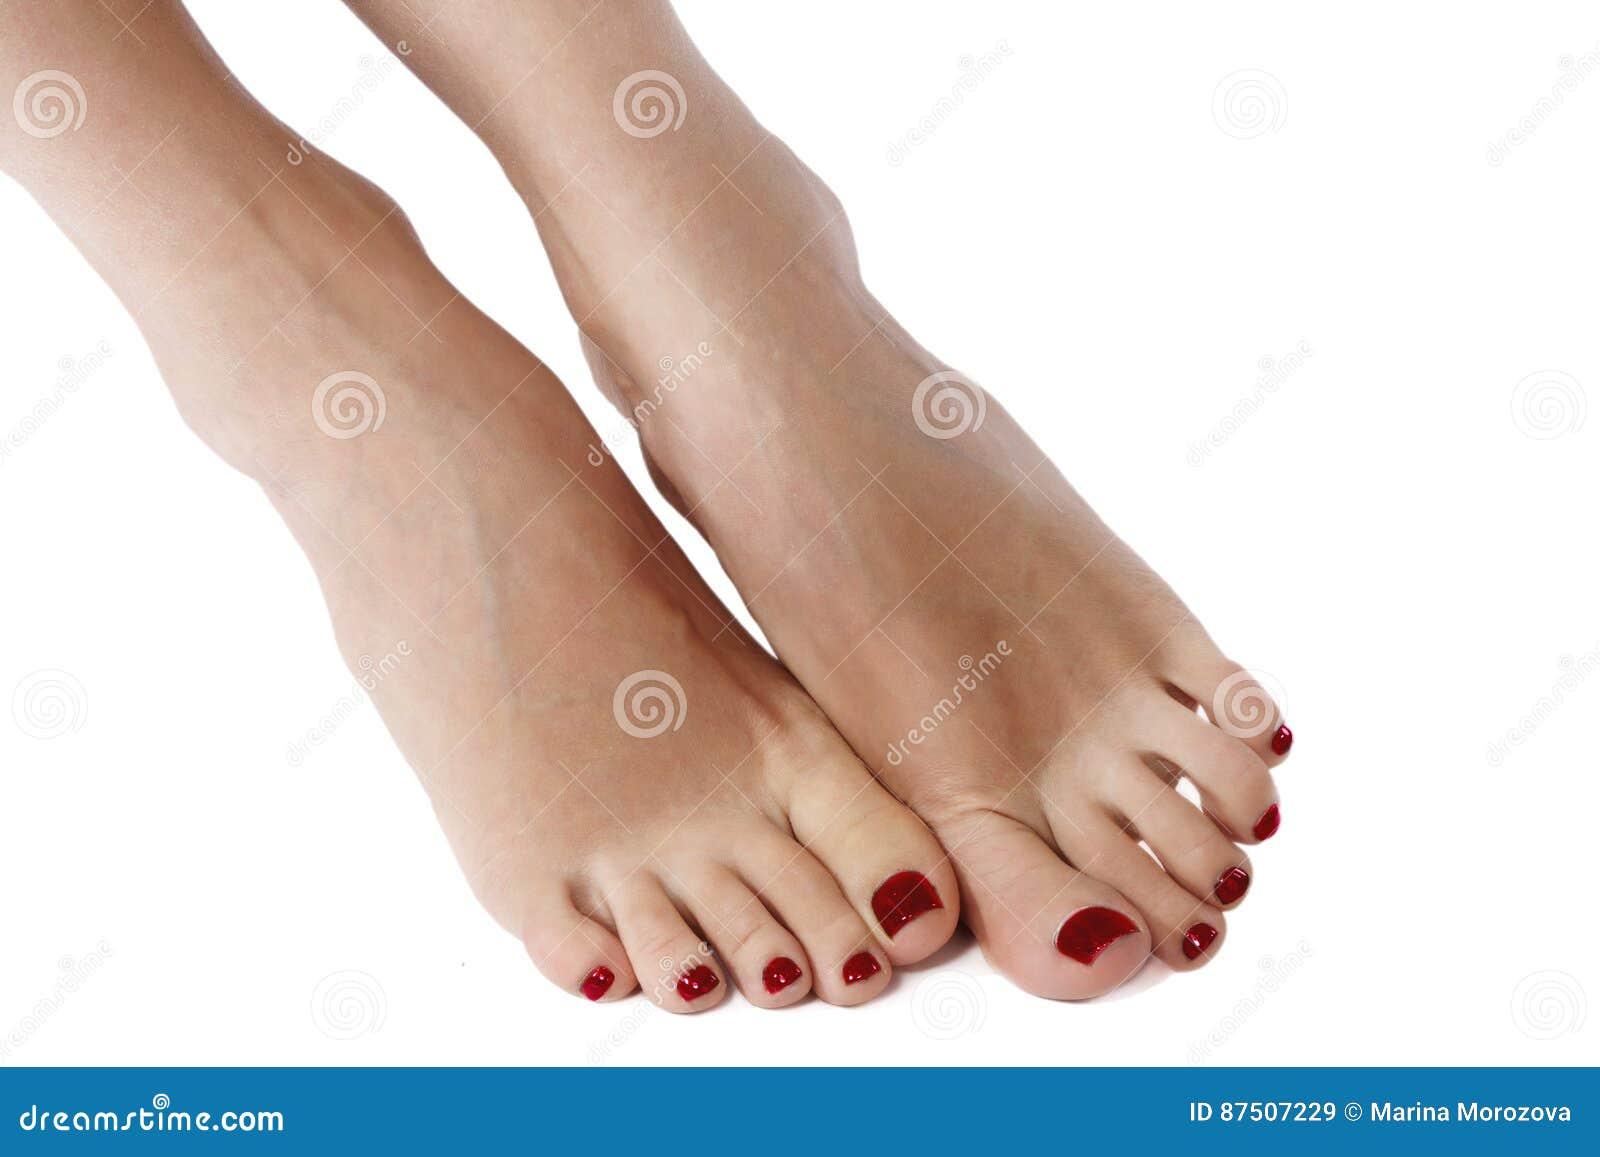 Beautiful female feet pics